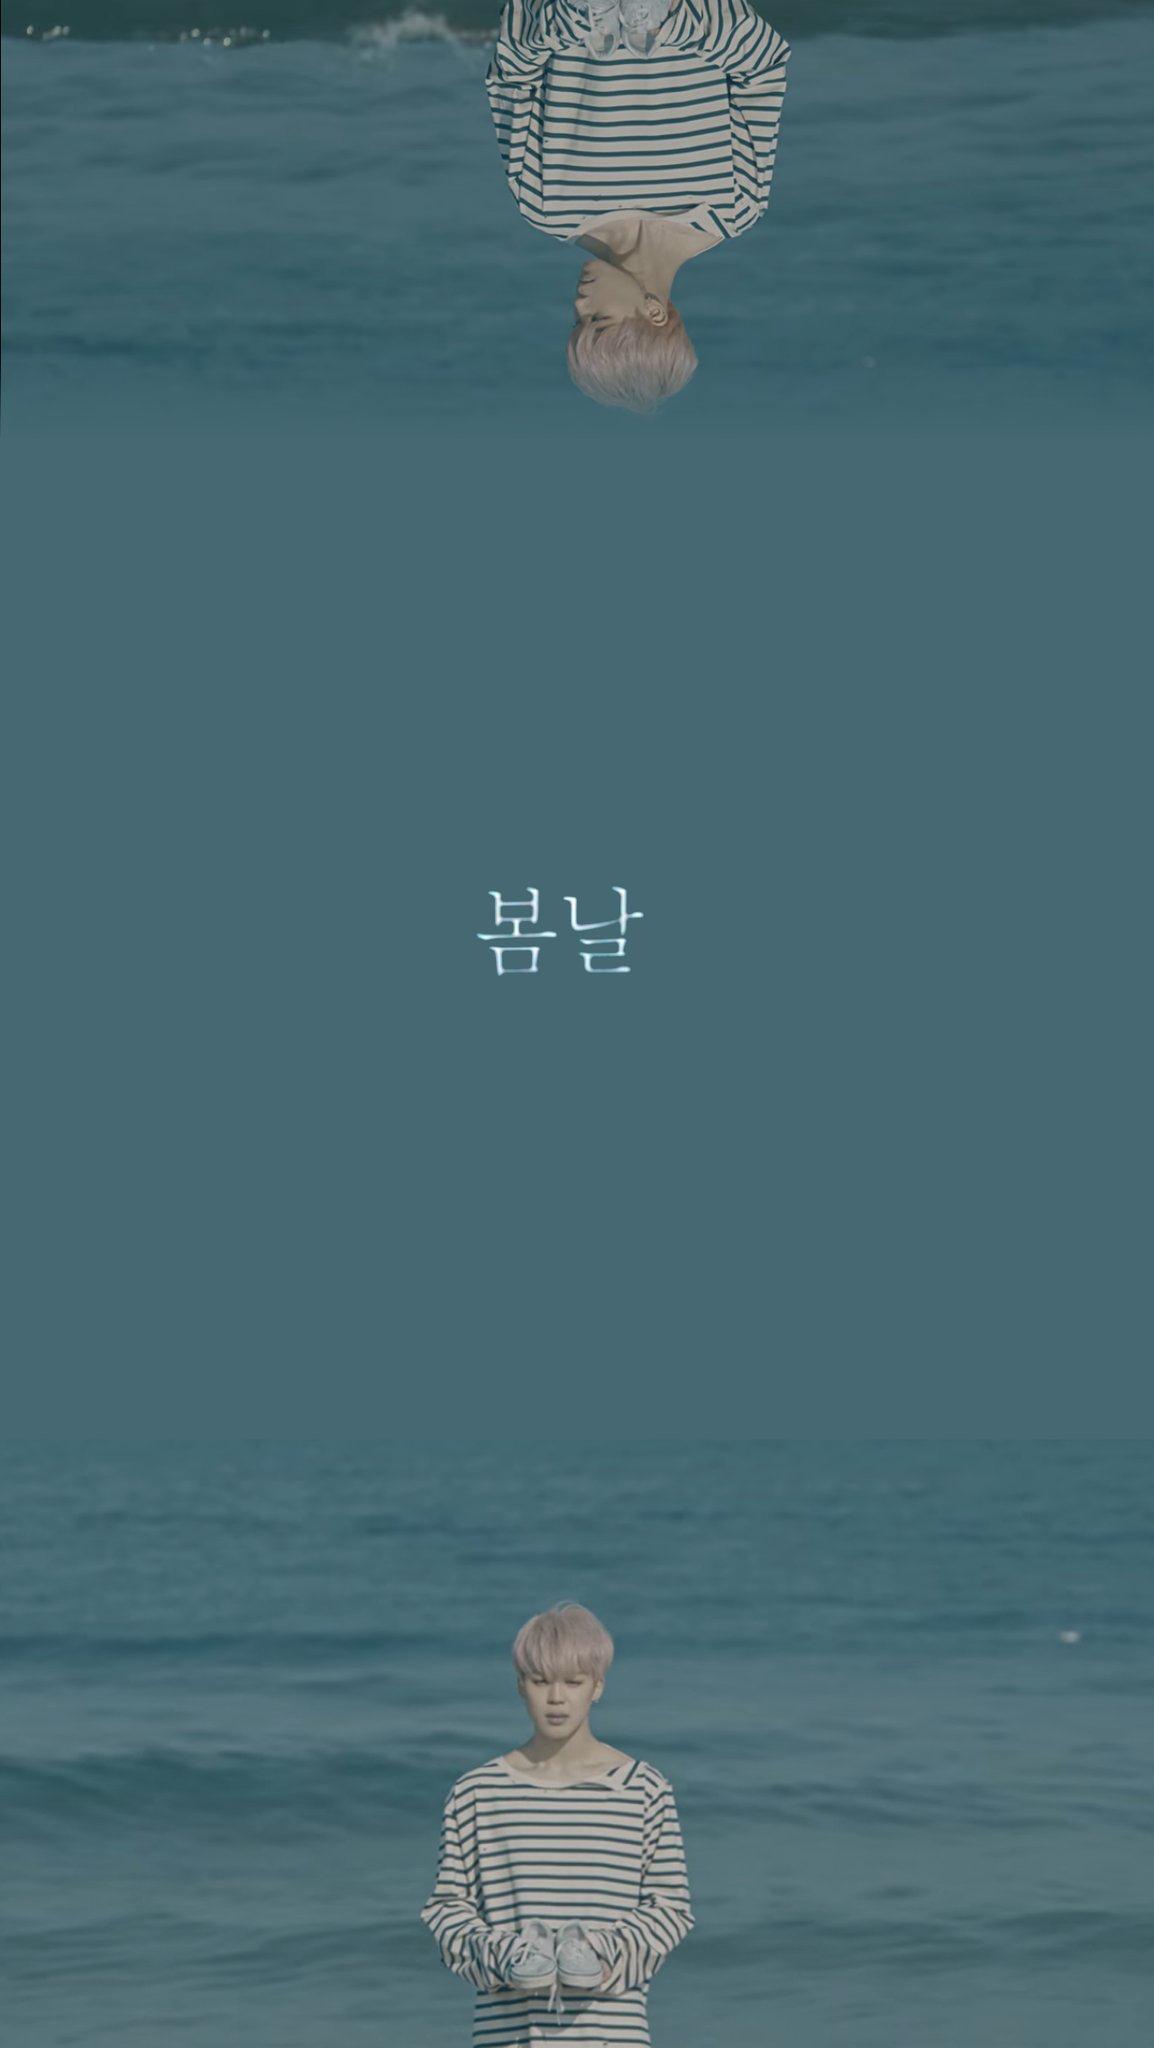 Jimin iphone wallpaper tumblr - Bts Bts Wallpapers Jimin You Never Walk Alone